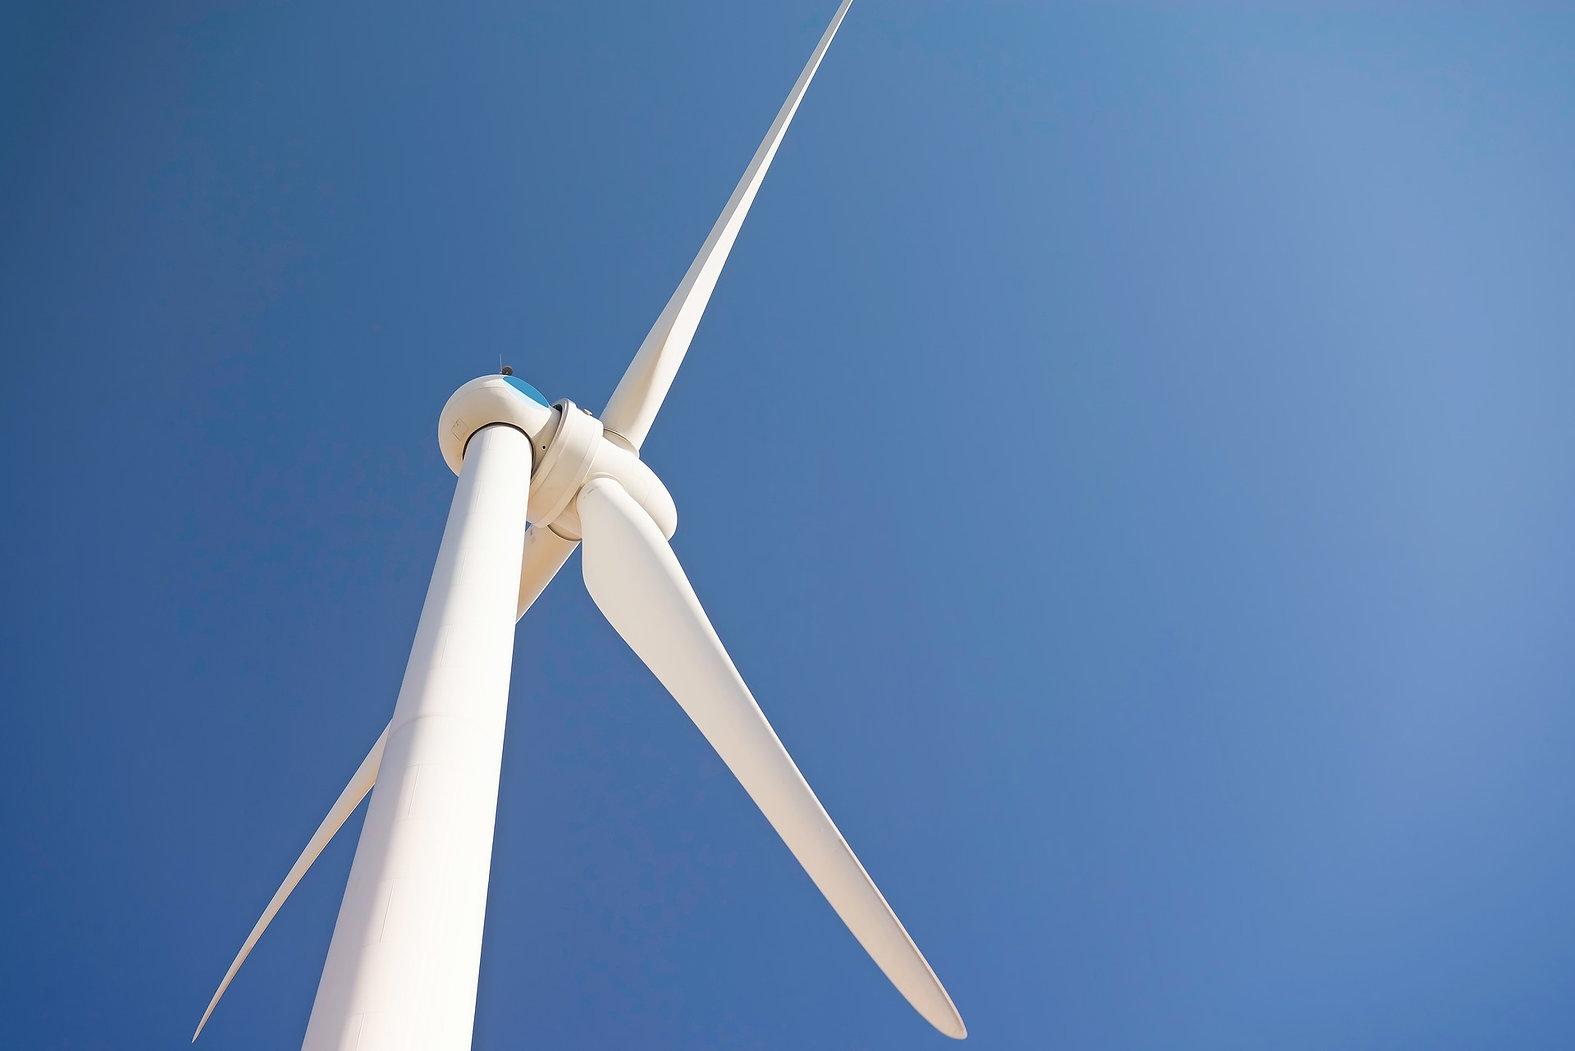 wind-3043896_1920.jpg